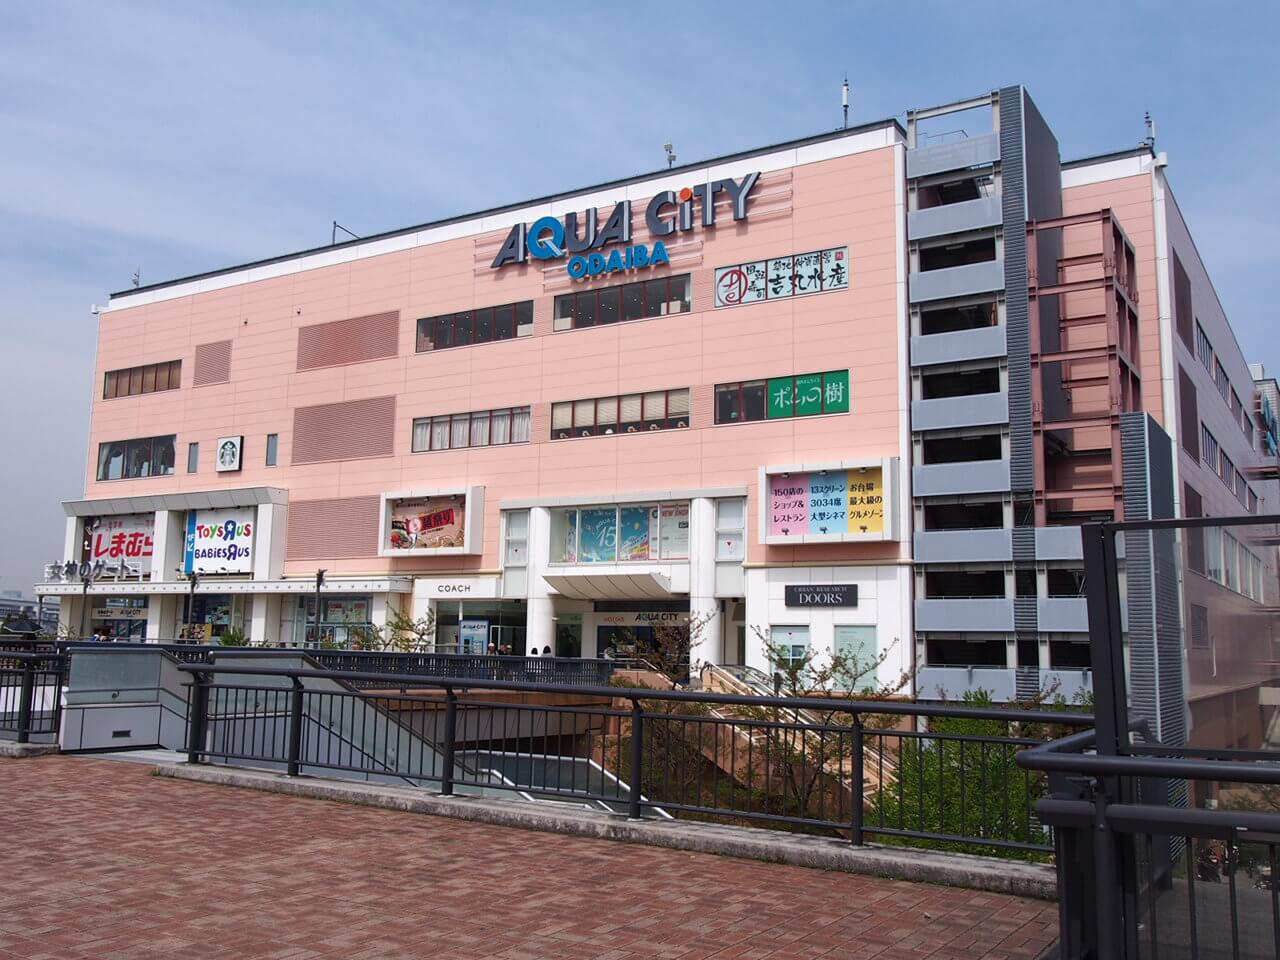 AQUA CITY 台場